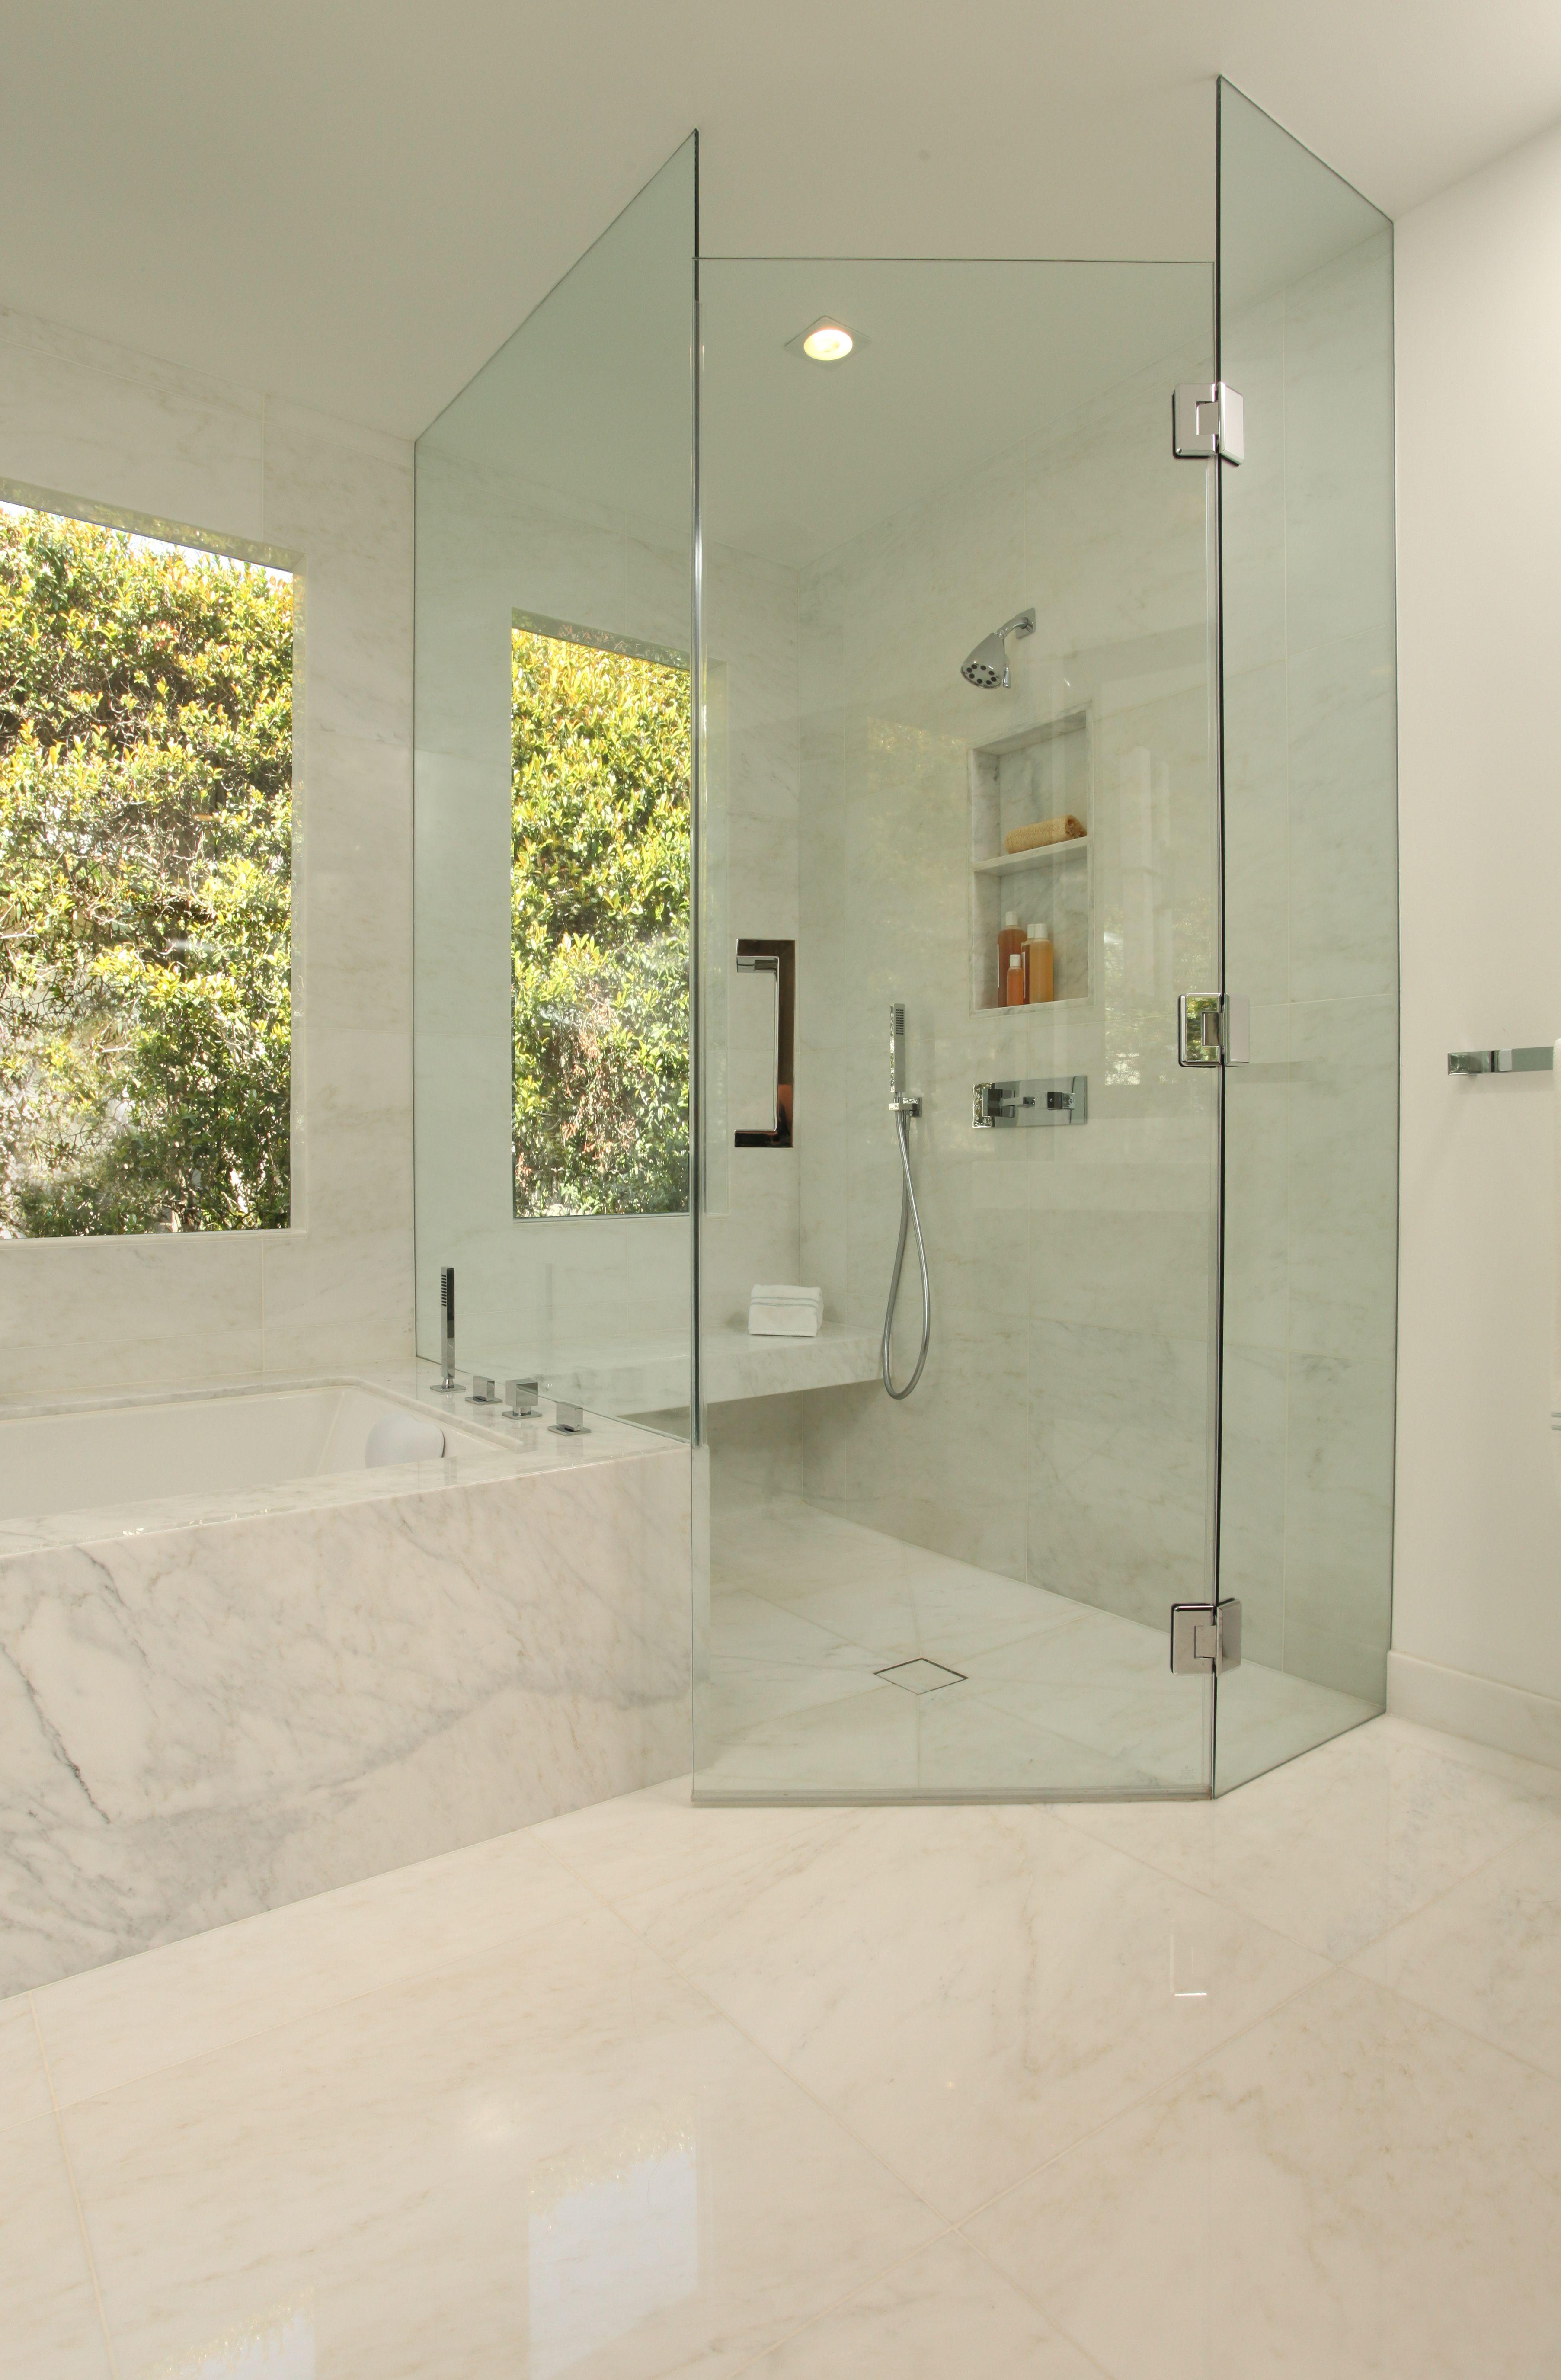 masterbathroom allwhite shower glassdoors bench custom